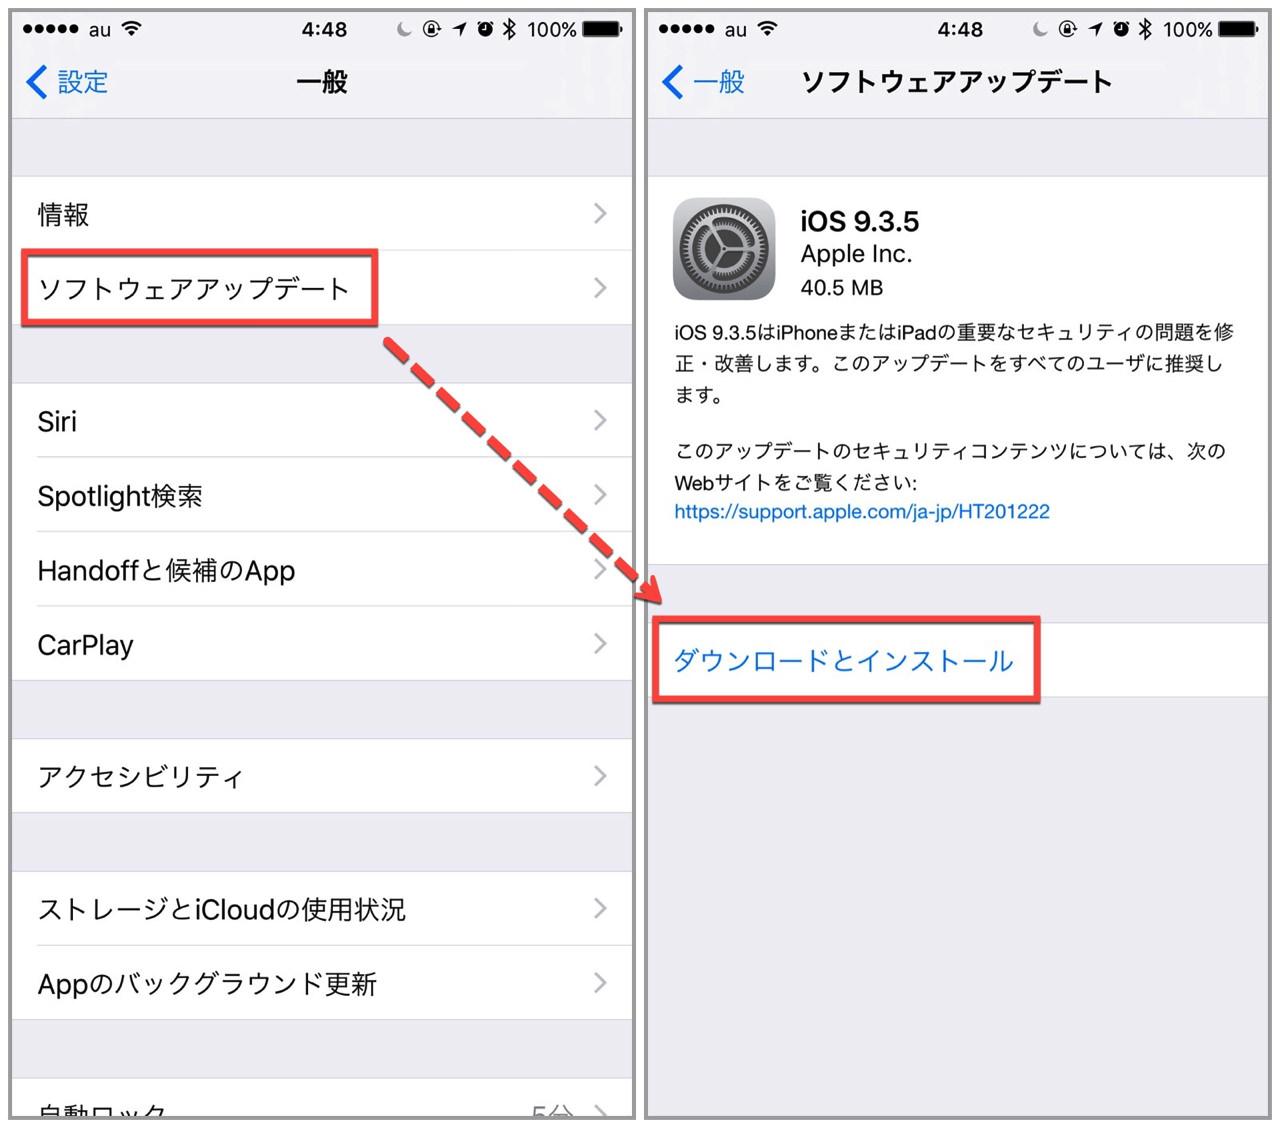 iOS9.3.5ソフトウェアアップデート